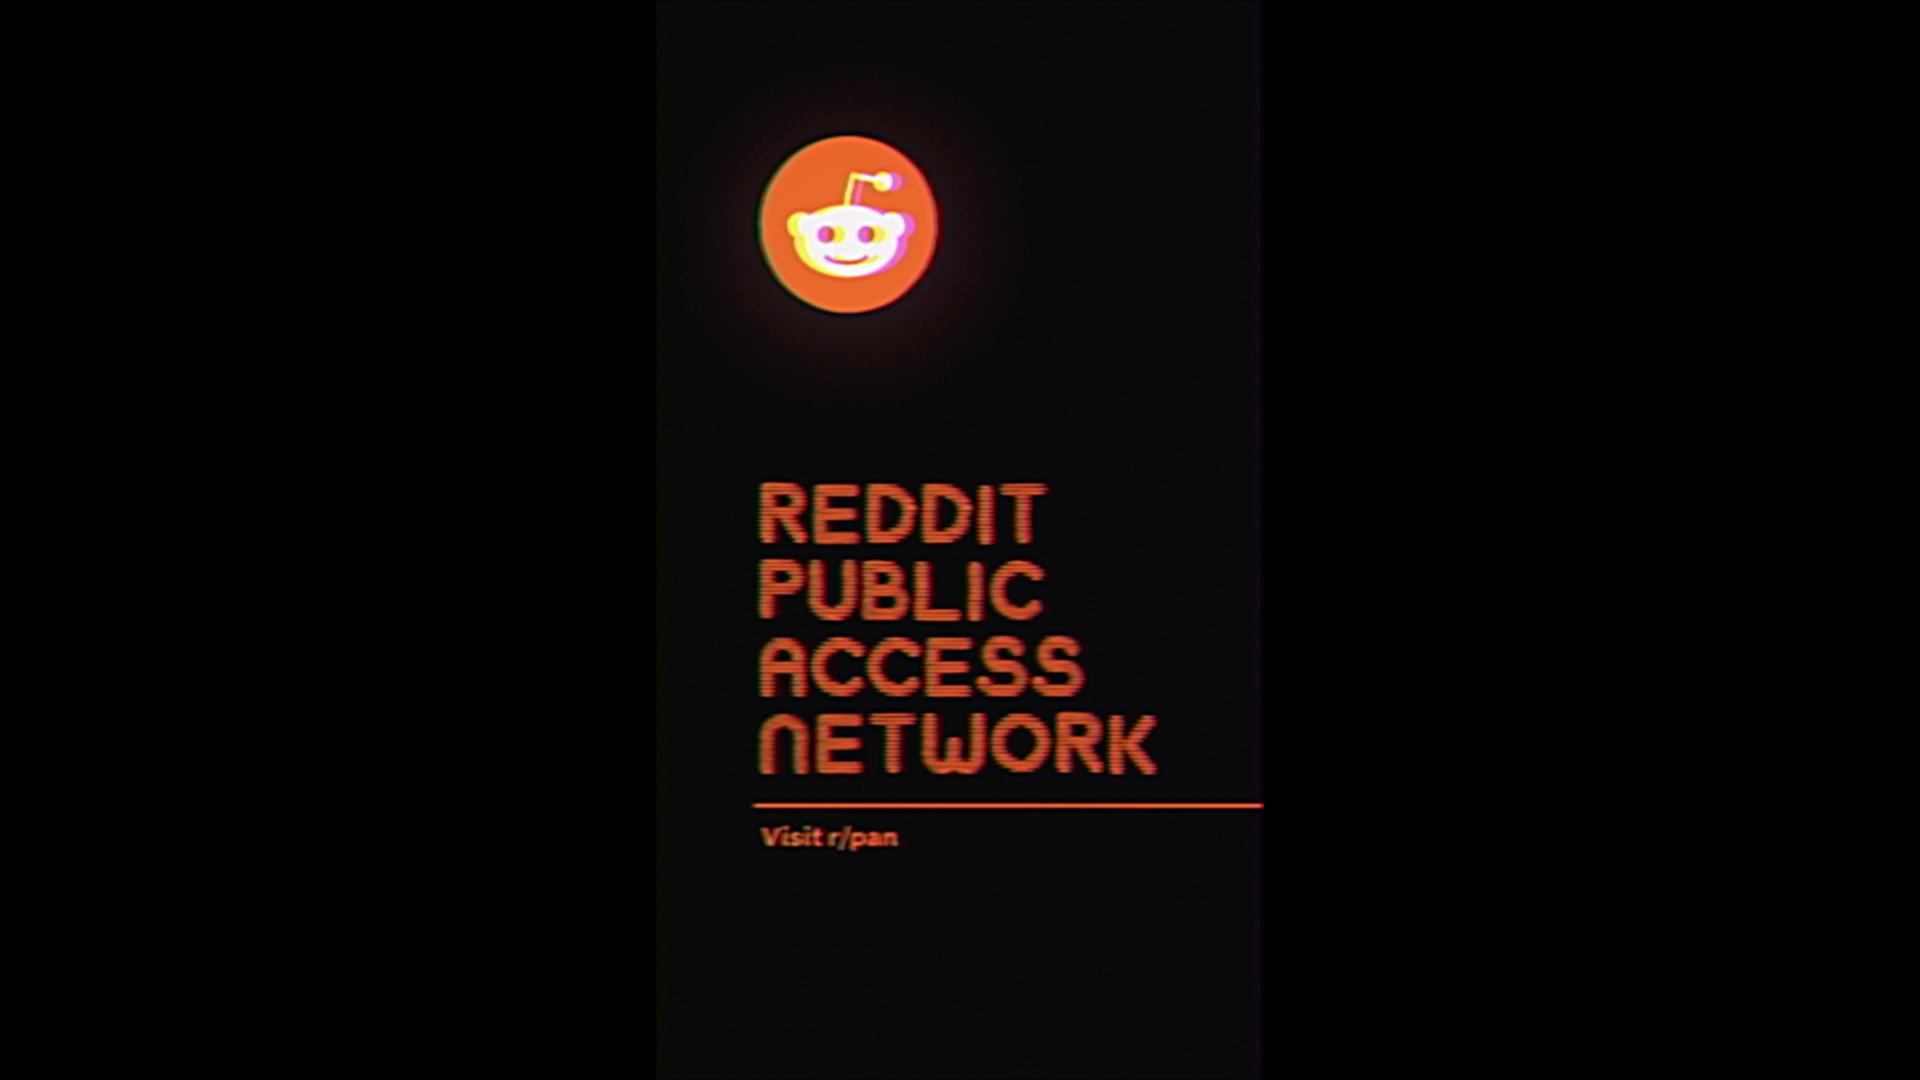 Reddit tests live broadcasting with 'Reddit Public Access